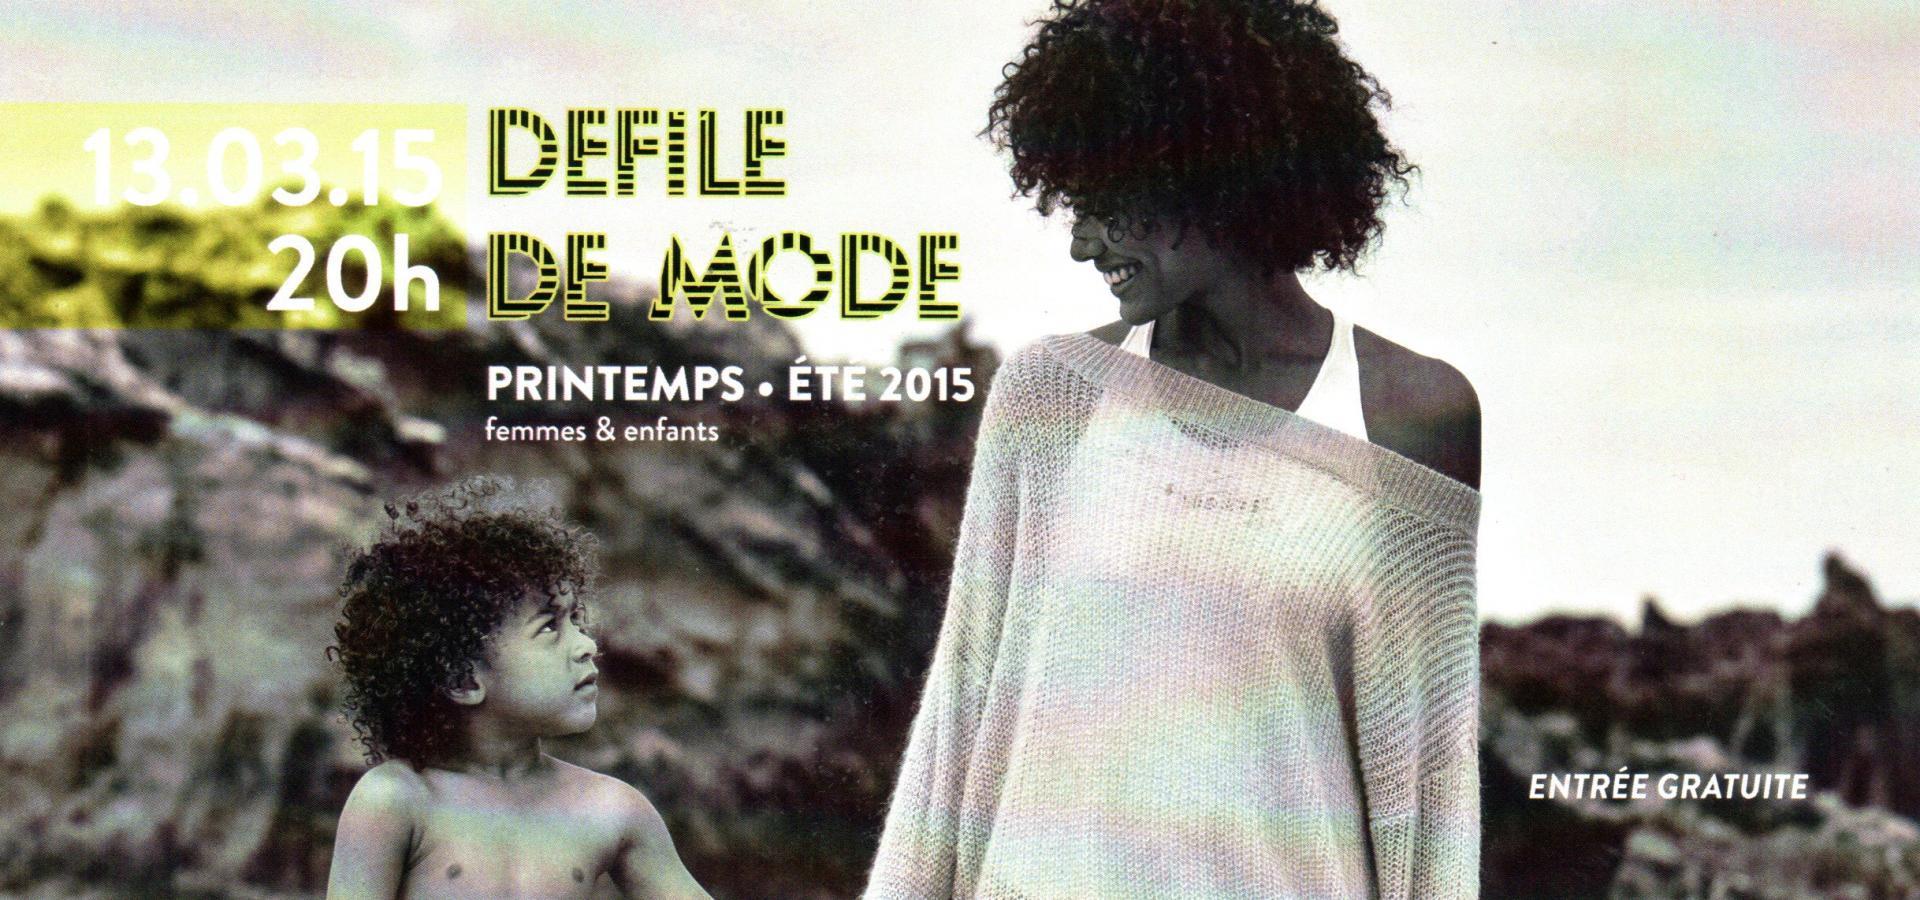 Défilé de Mode - 2015